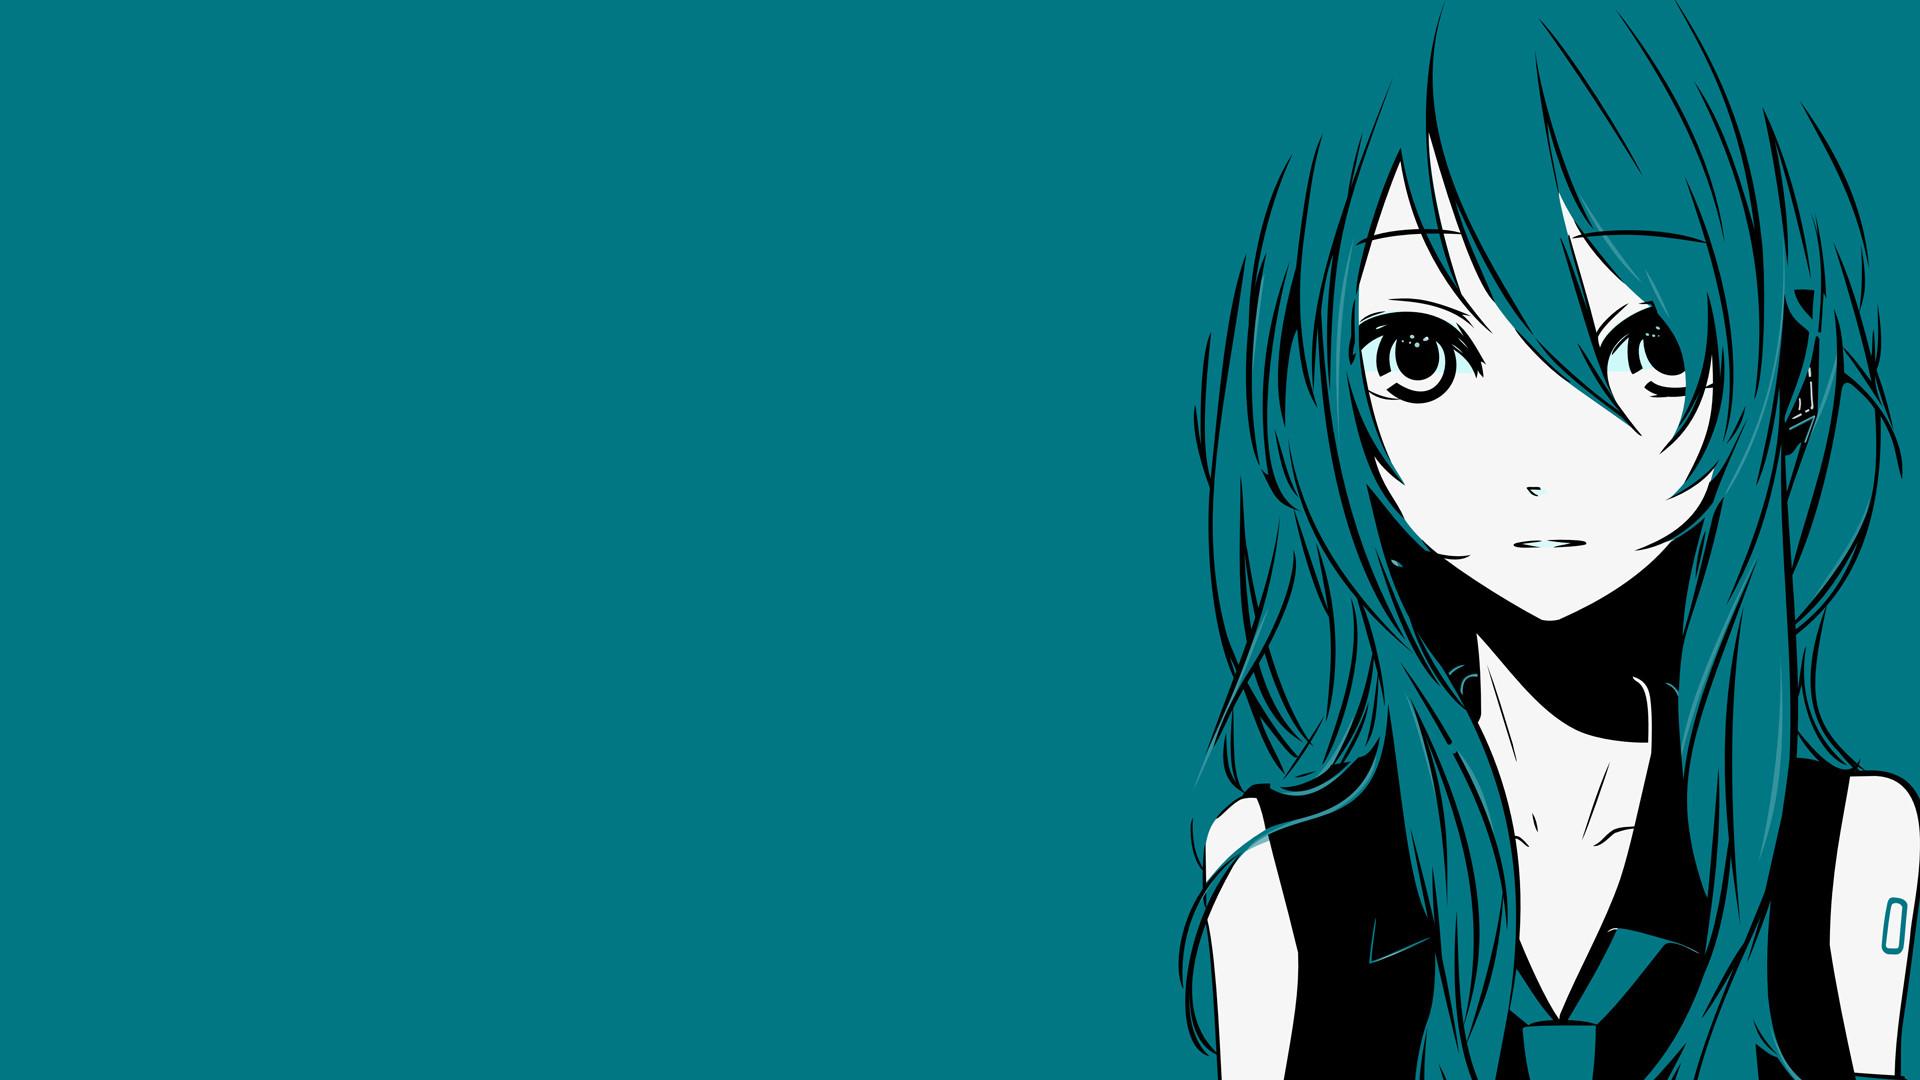 Free download Anime Wallpaper